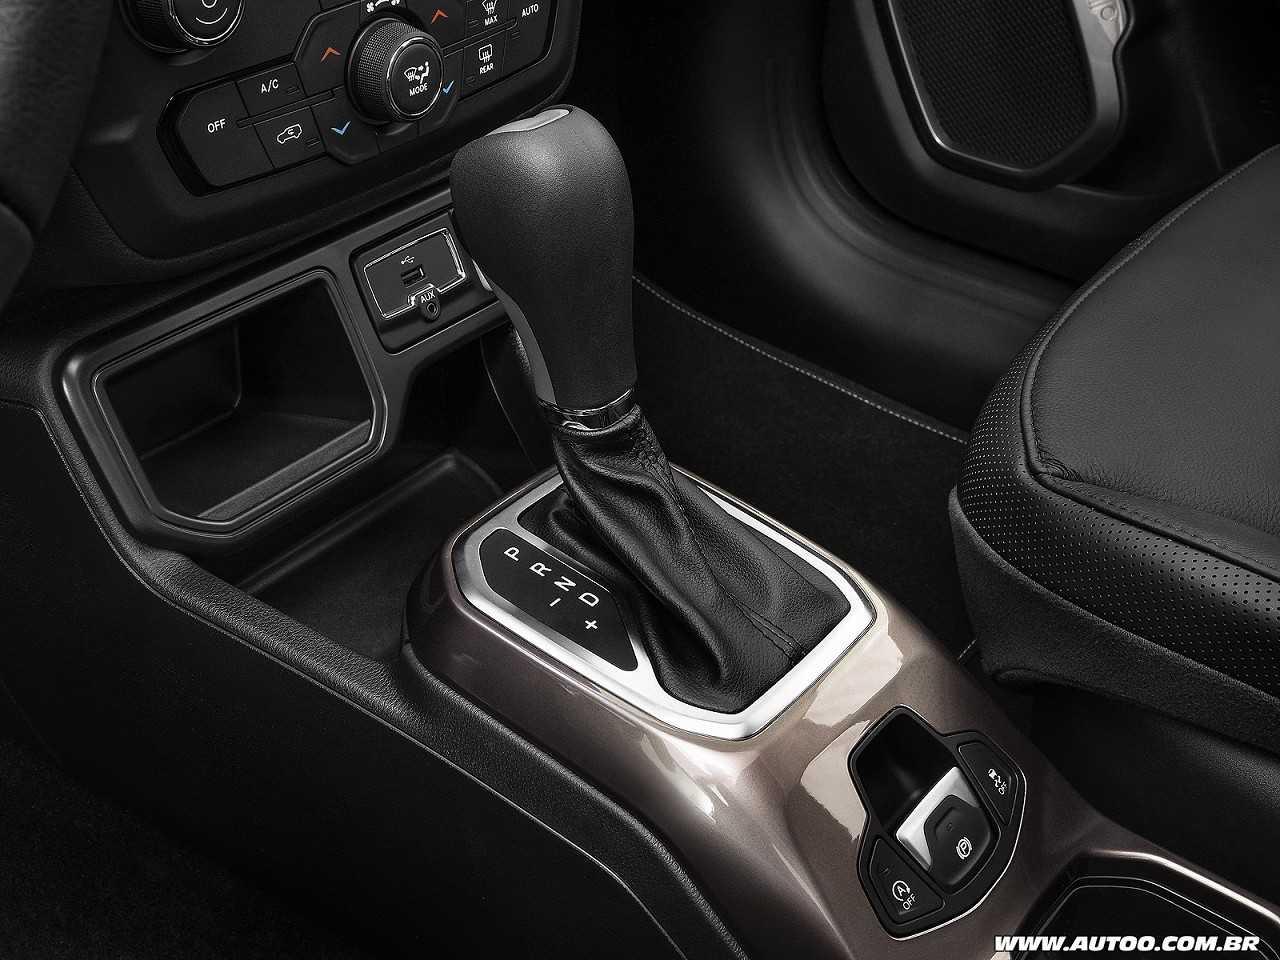 JeepRenegade 2019 - câmbio